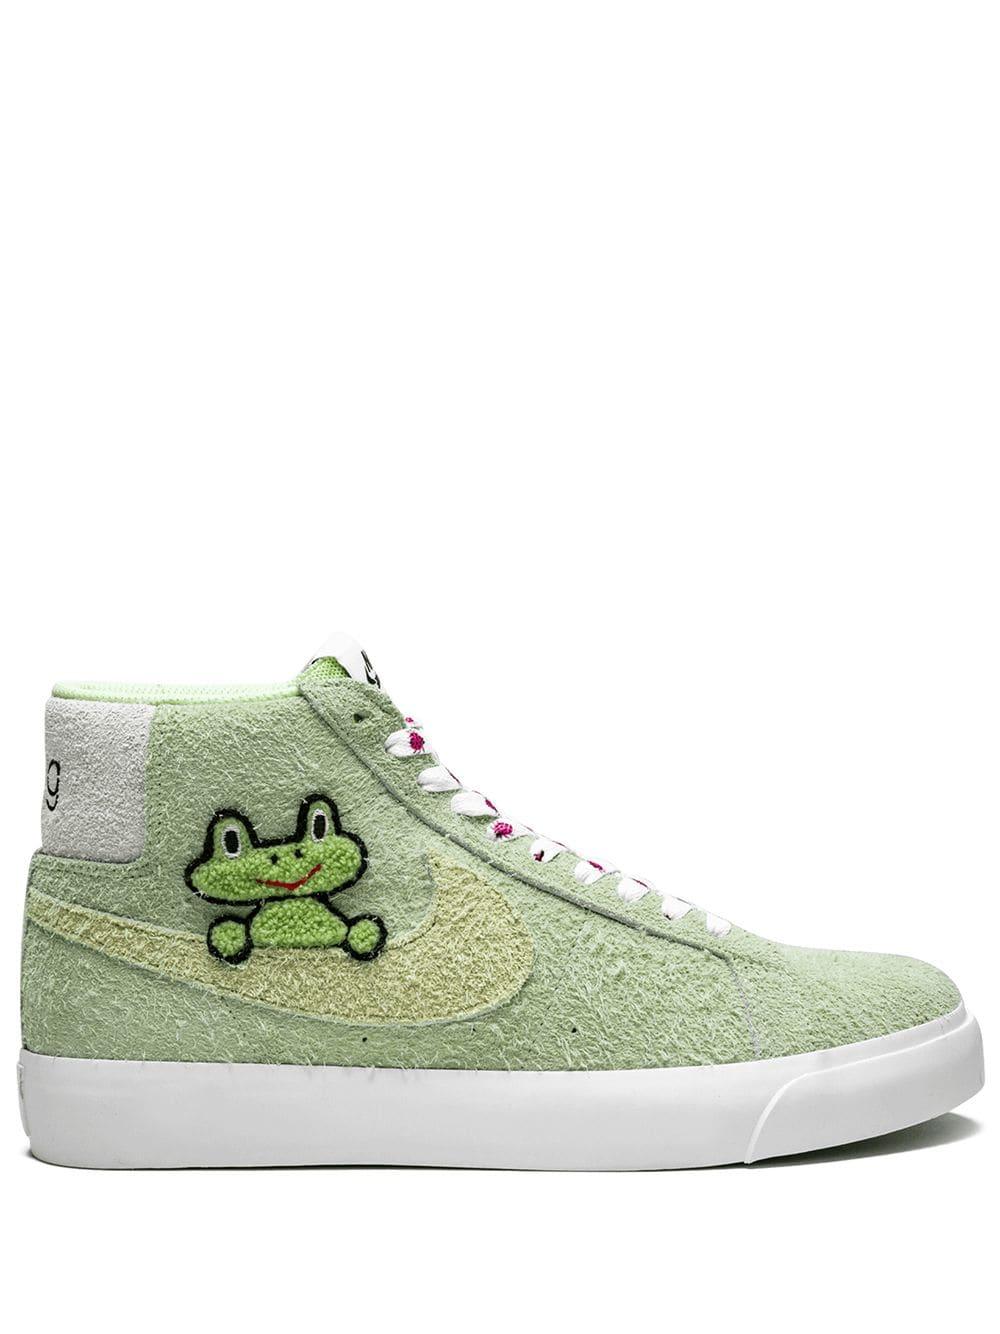 Nike X Frog Skateboards Sb Zoom Blazer